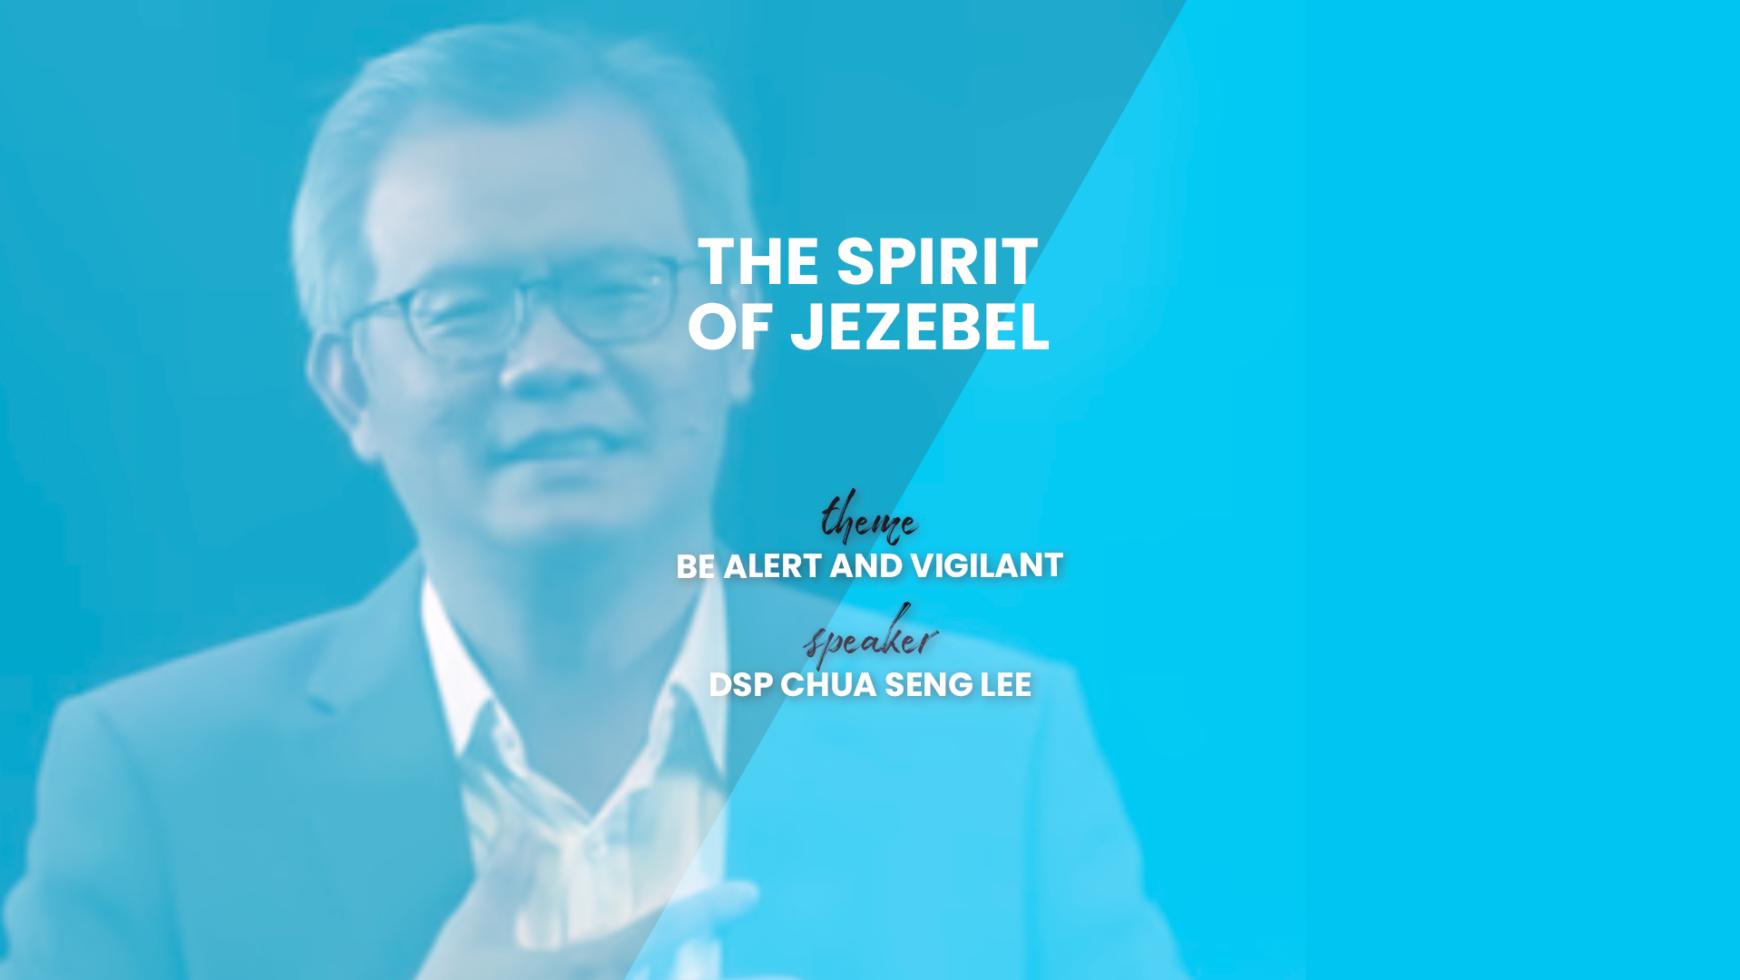 The Spirit of Jezebel – DSP Chua Seng Lee